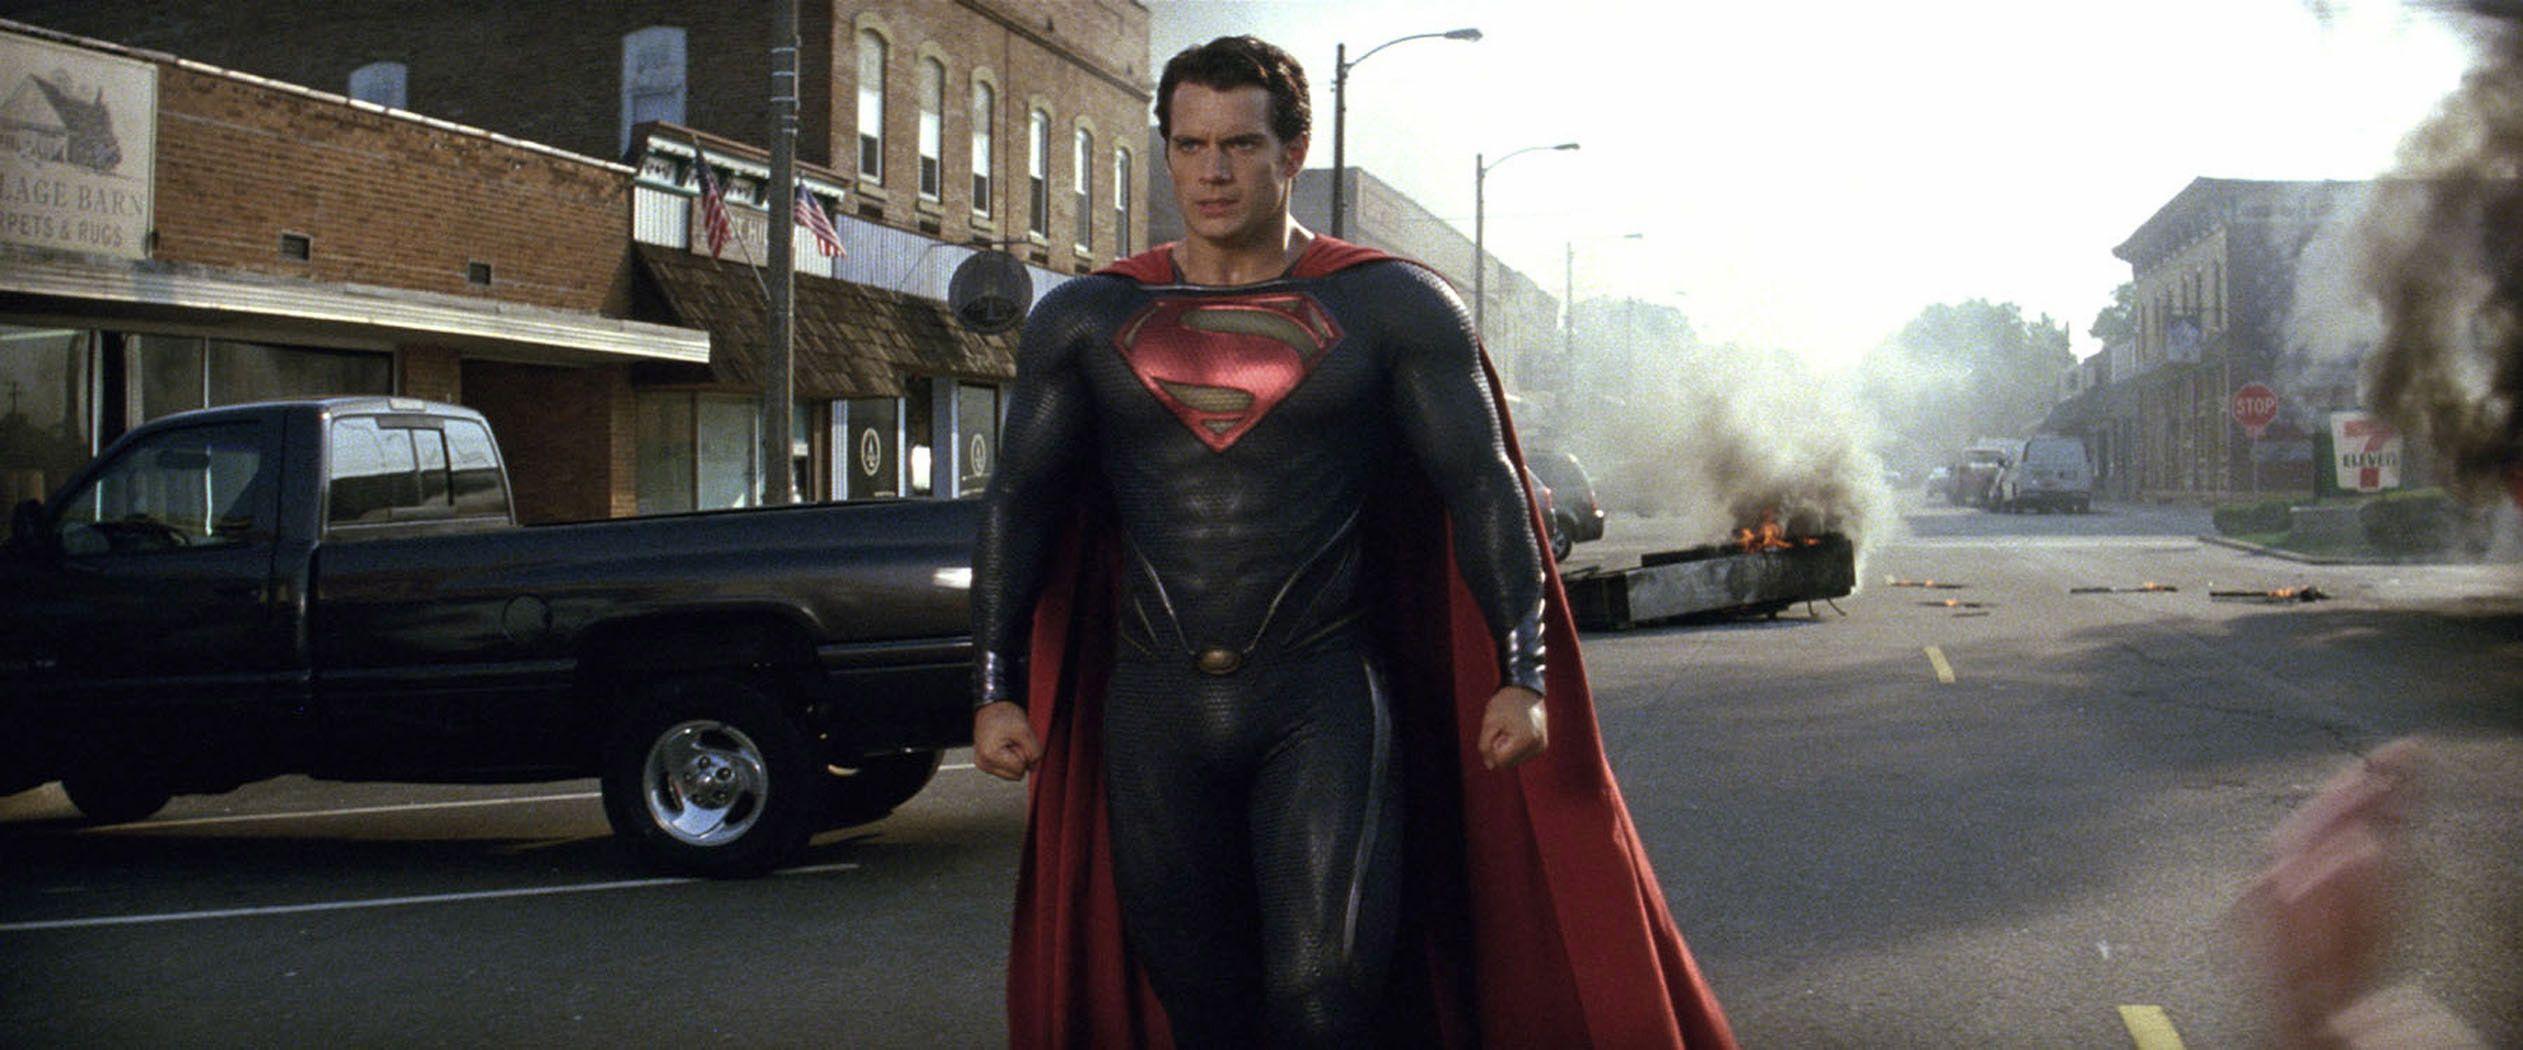 3d Superman Wallpaper Ii Android Man Of Steel Superman Wallpapers Wallpaper Cave